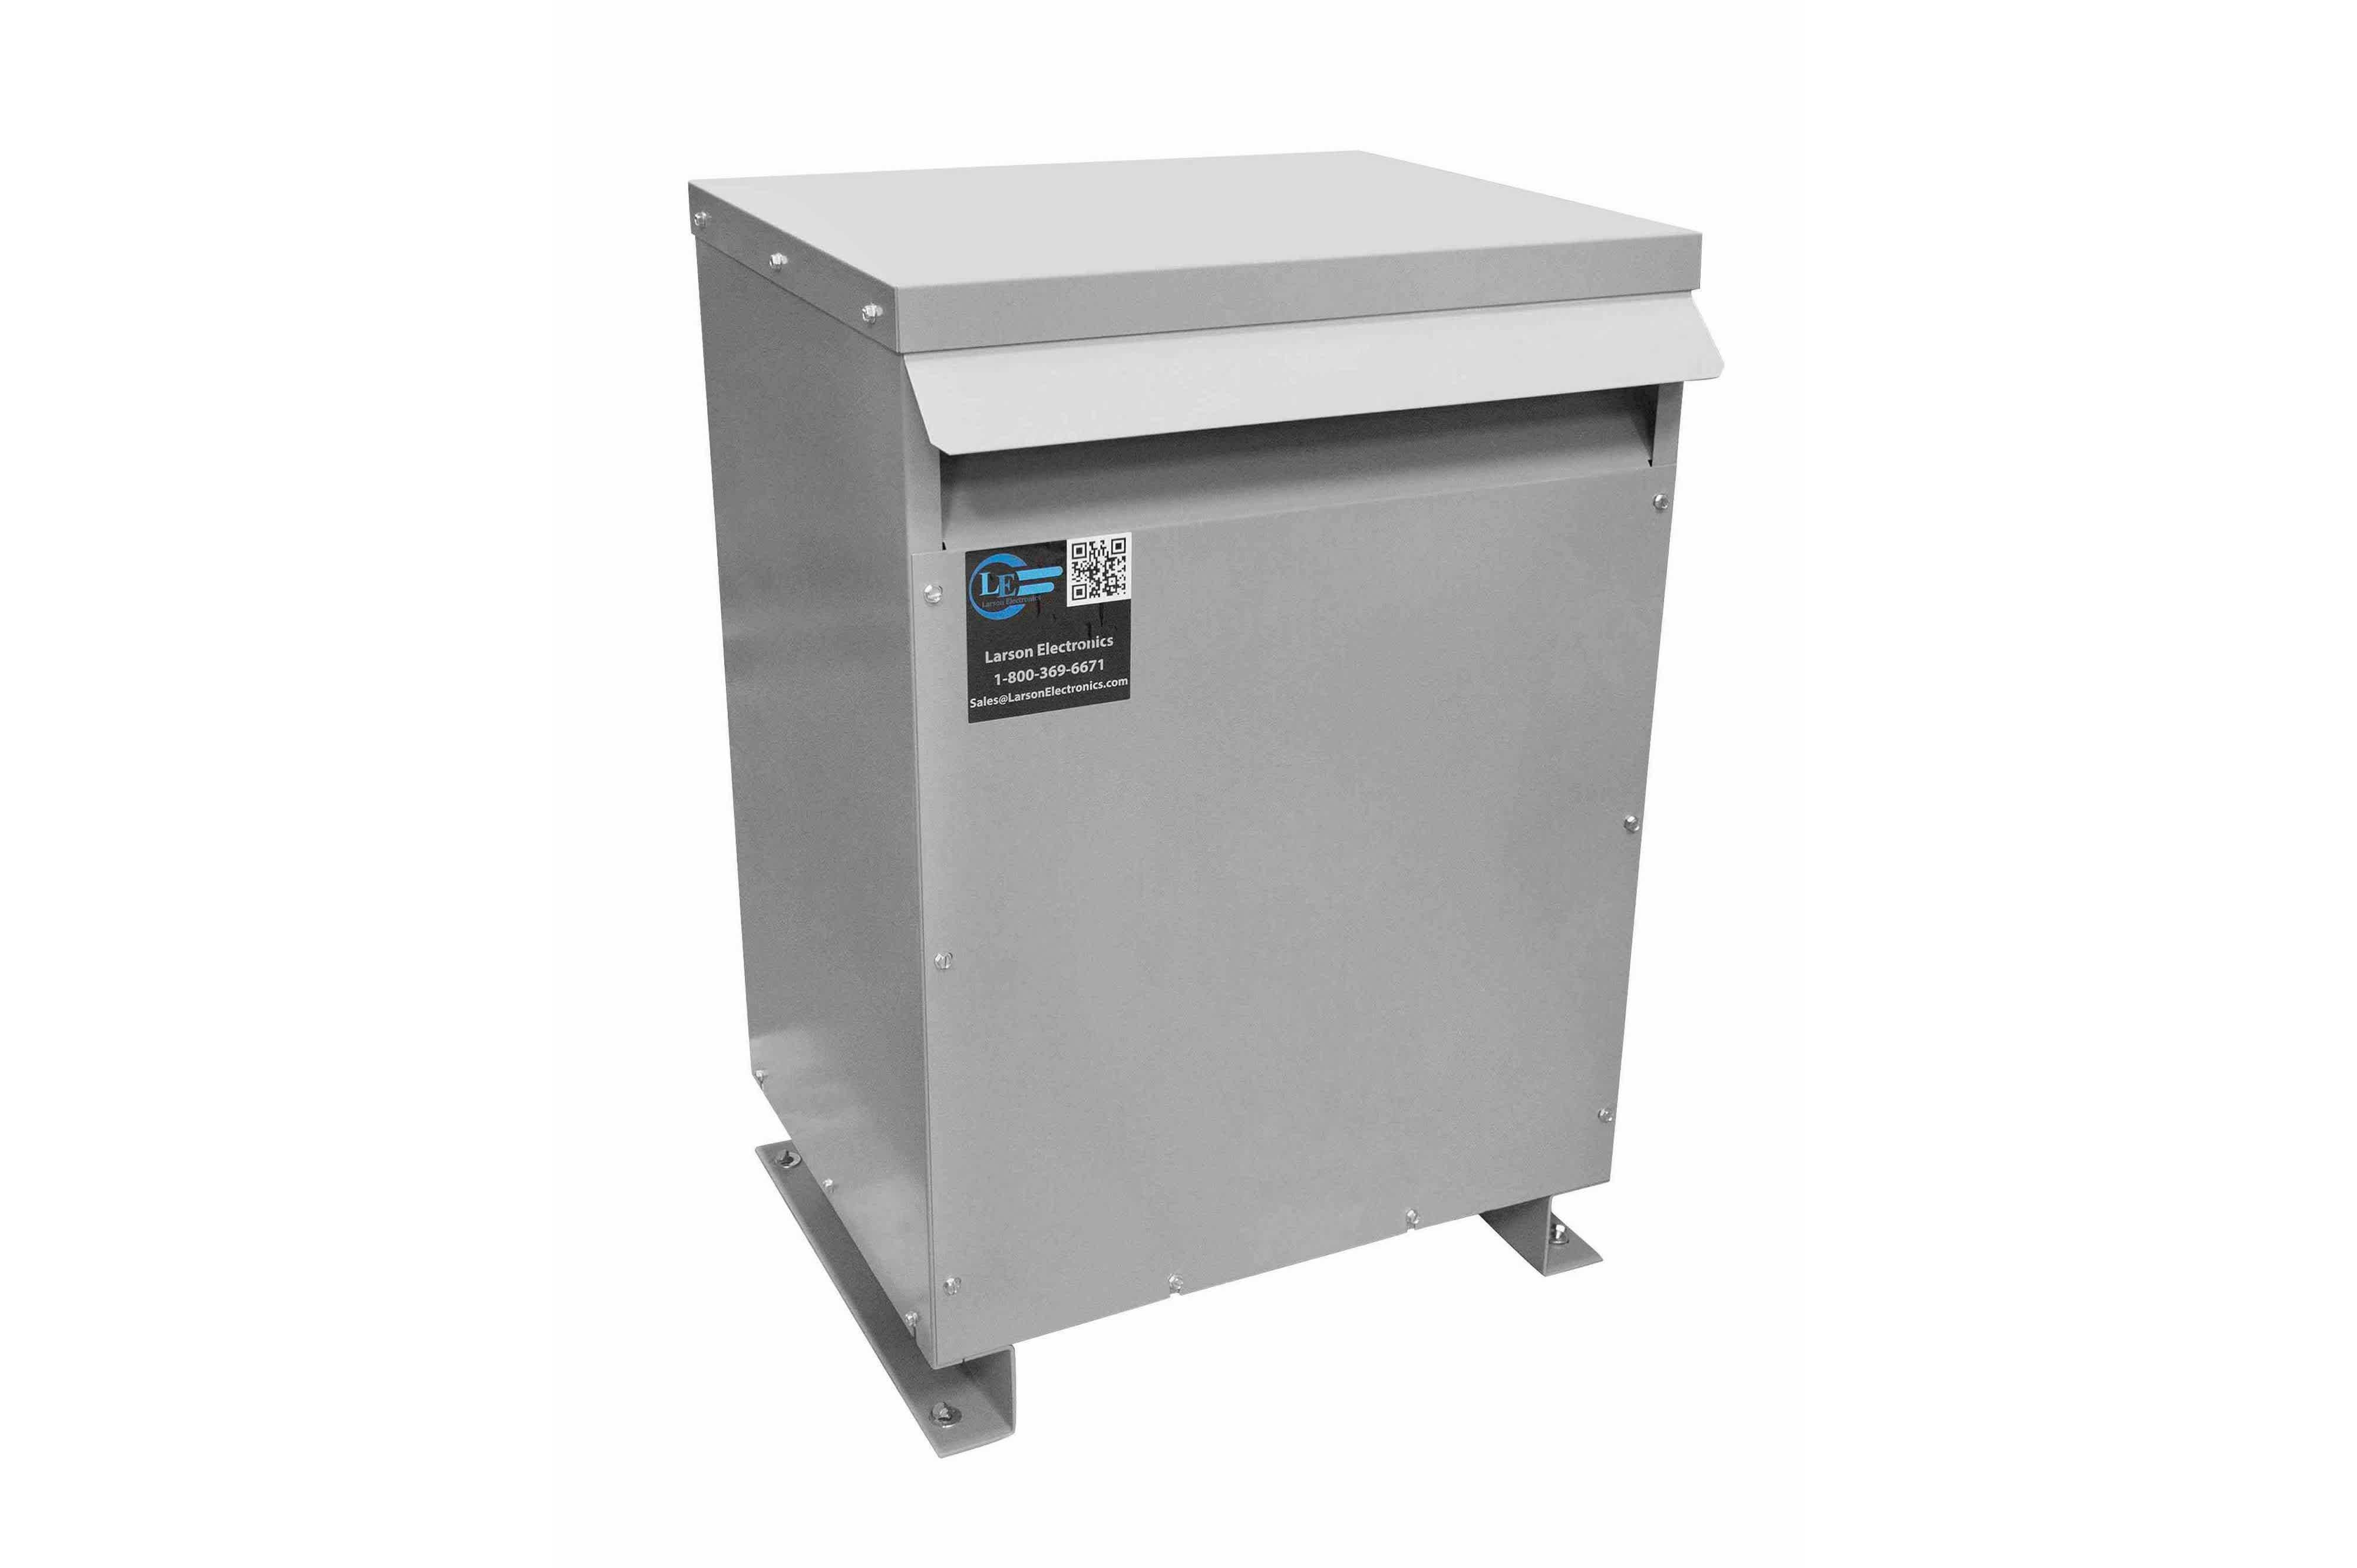 29 kVA 3PH Isolation Transformer, 208V Wye Primary, 600Y/347 Wye-N Secondary, N3R, Ventilated, 60 Hz